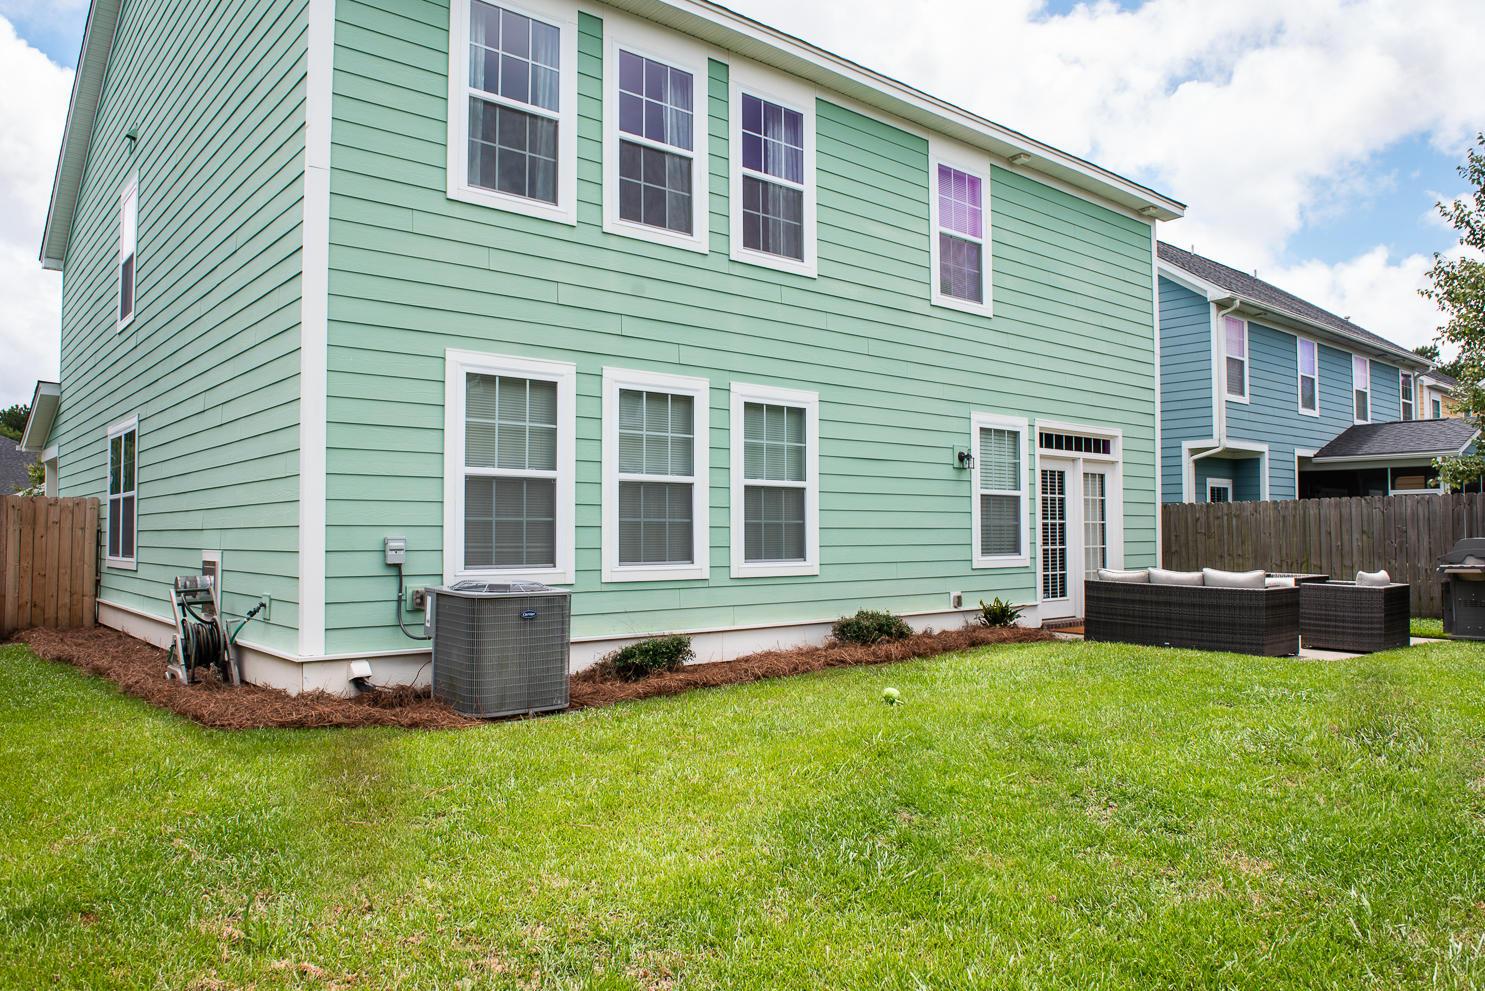 Nelliefield Plantation Homes For Sale - 119 Indigo Marsh, Wando, SC - 3